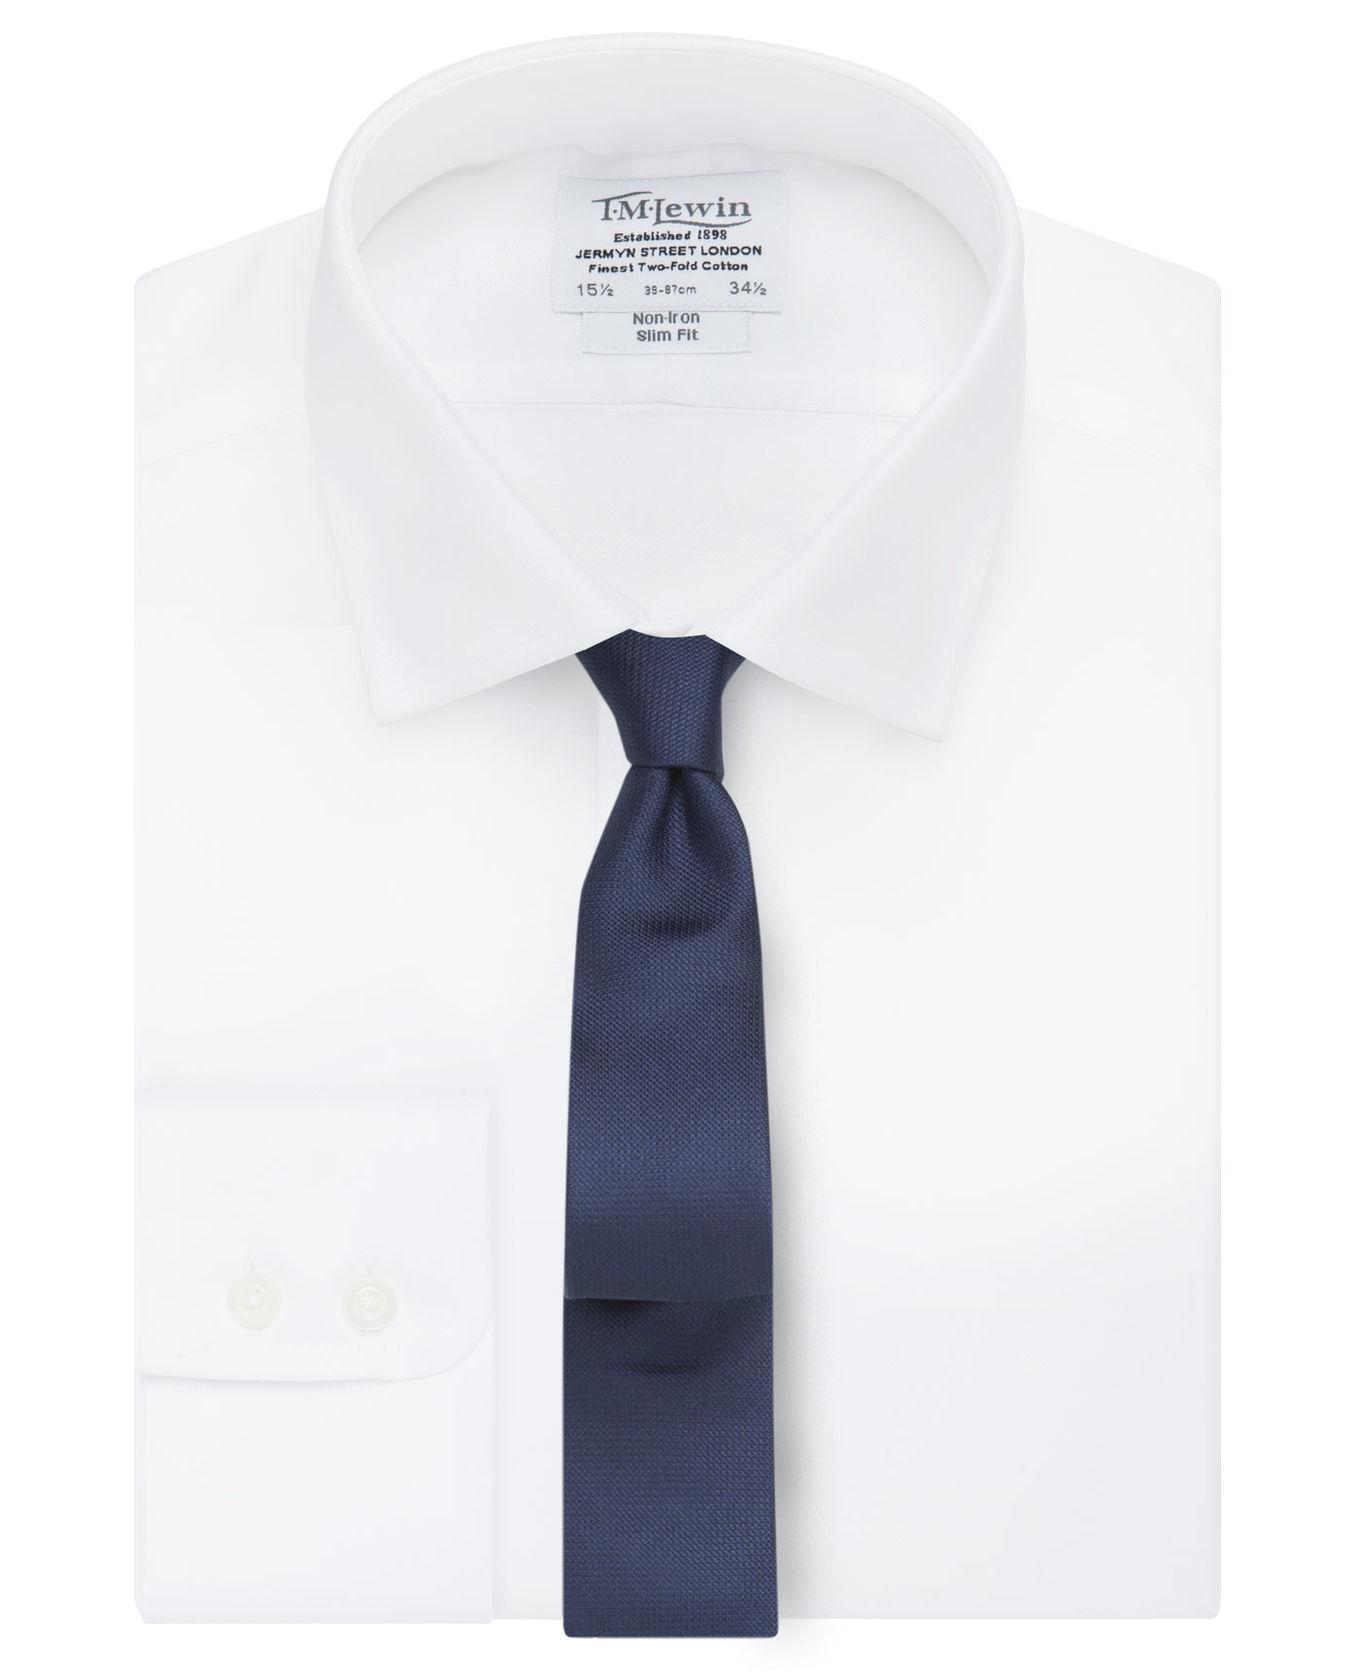 T.M. Lewin Dress Shirts 29.50 Free Shipping